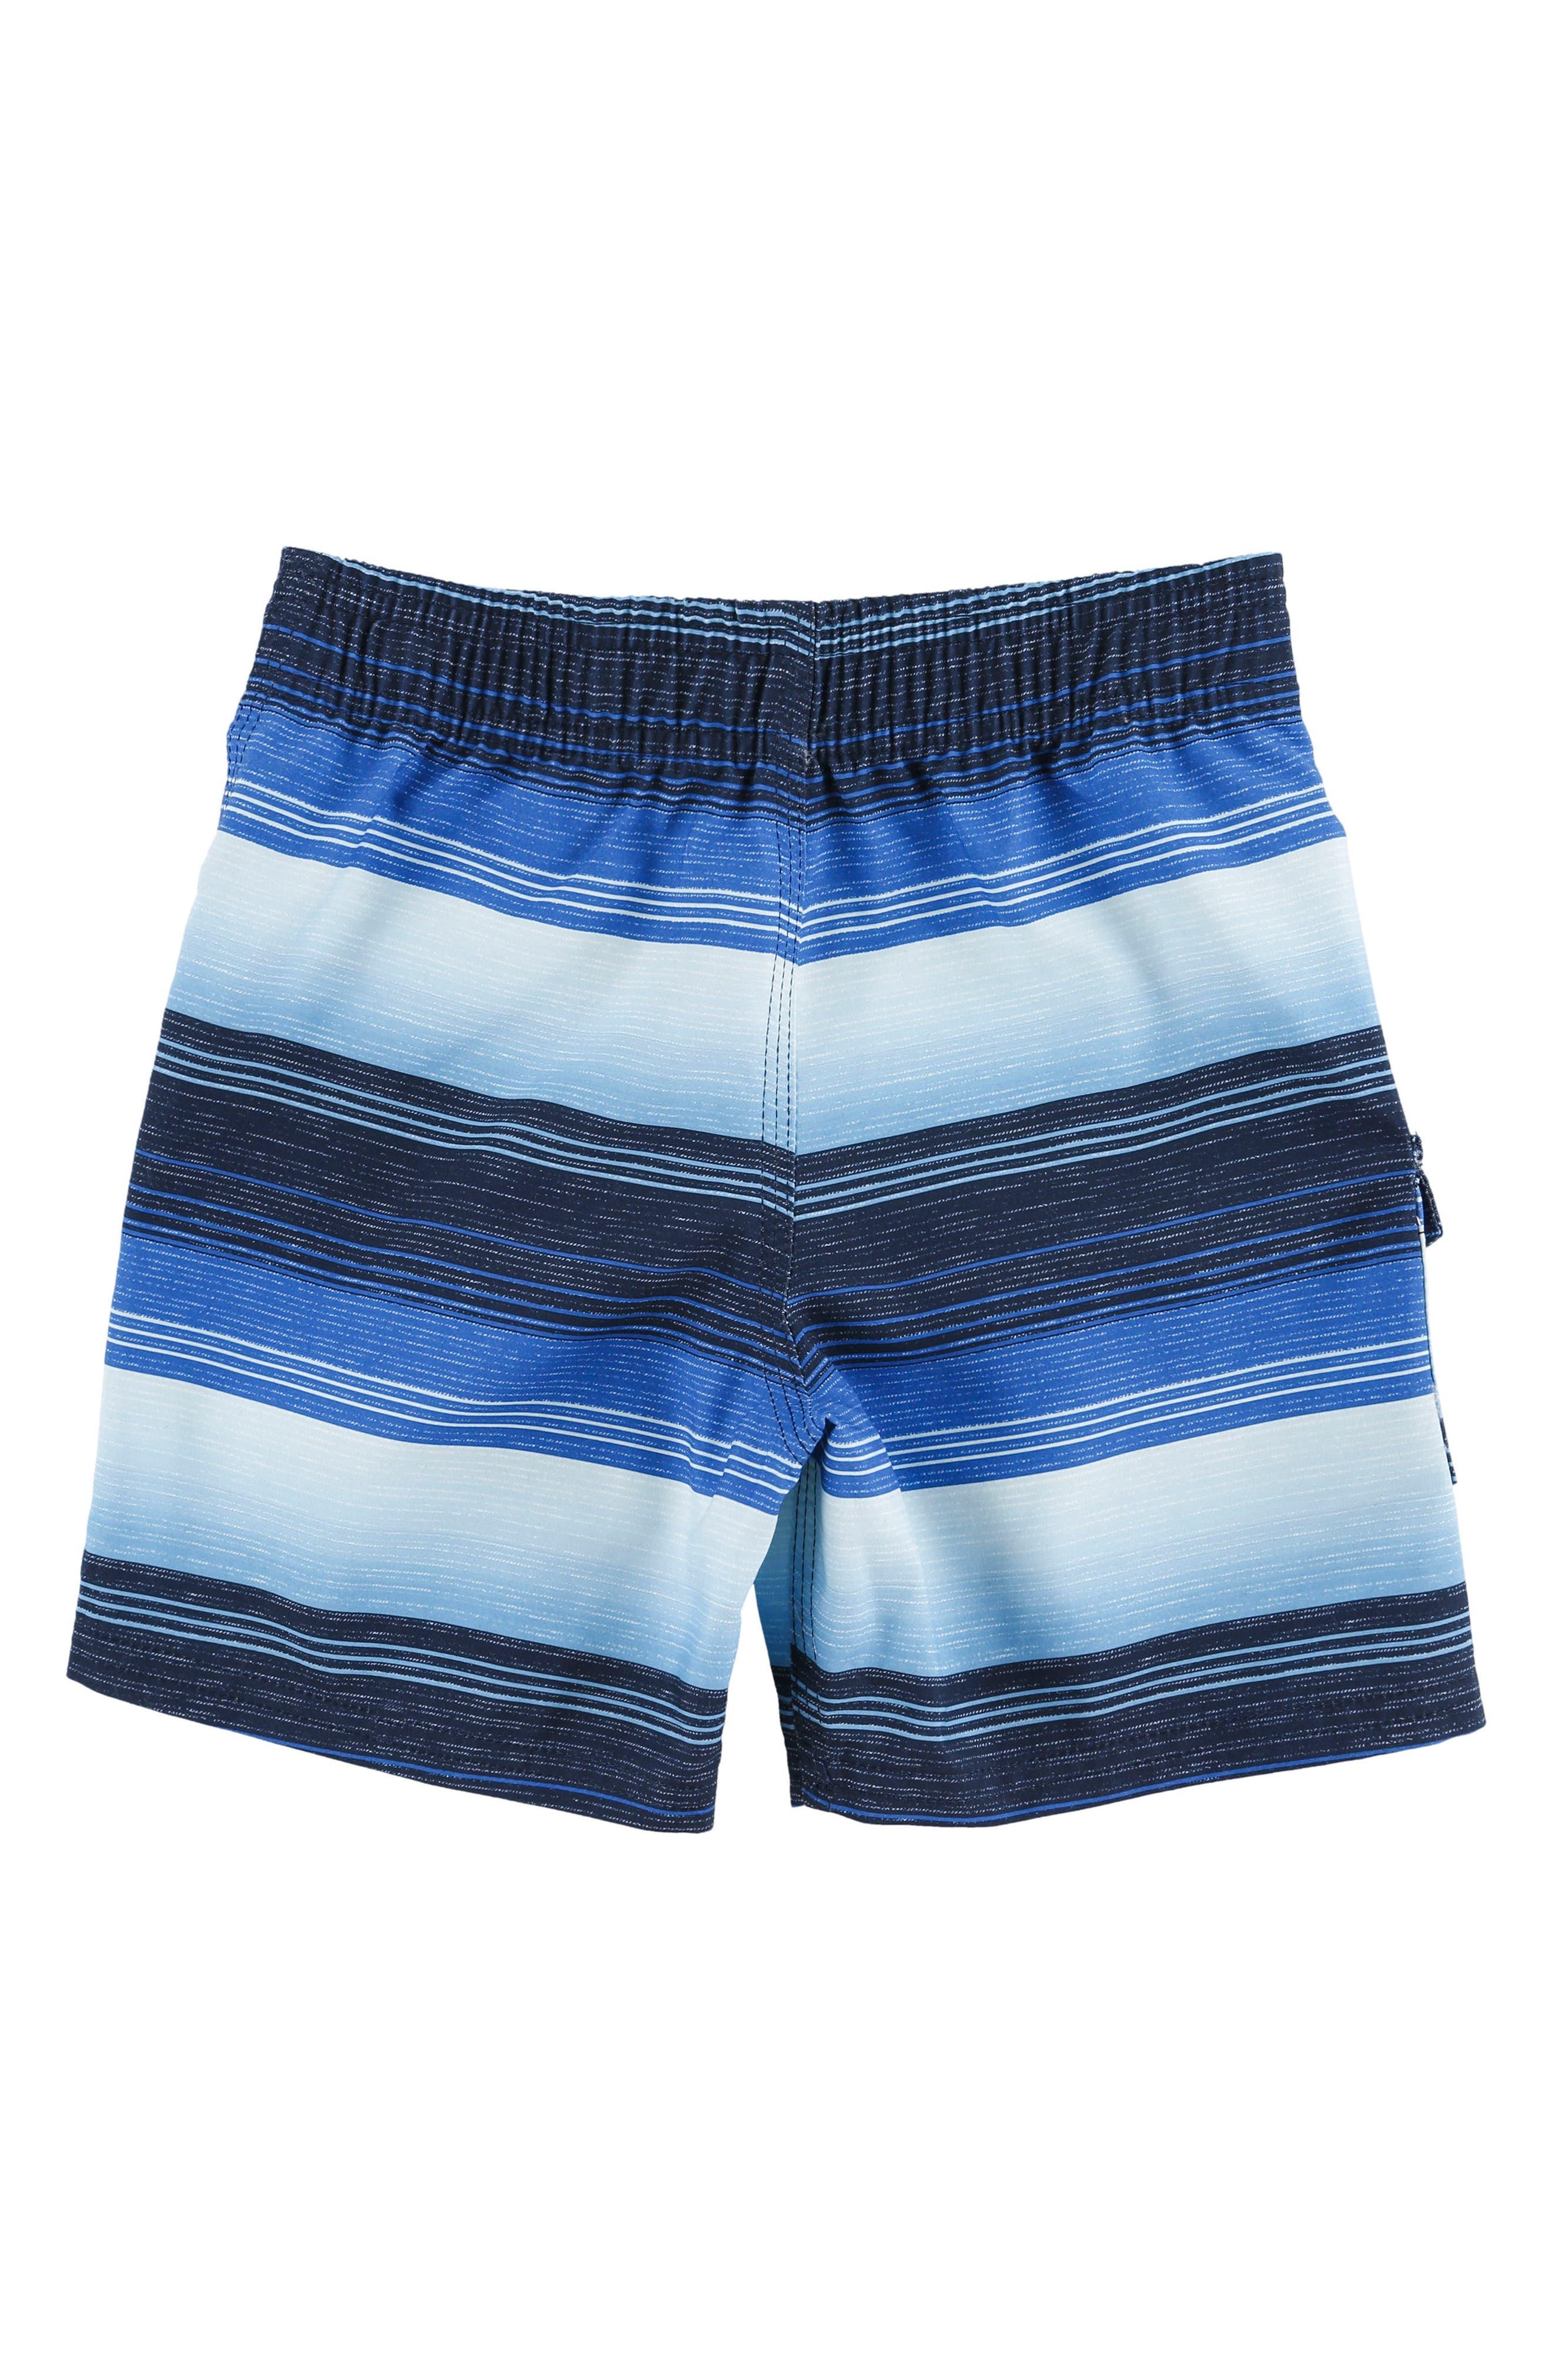 Santa Cruz Stripe Board Shorts,                             Alternate thumbnail 2, color,                             Blue